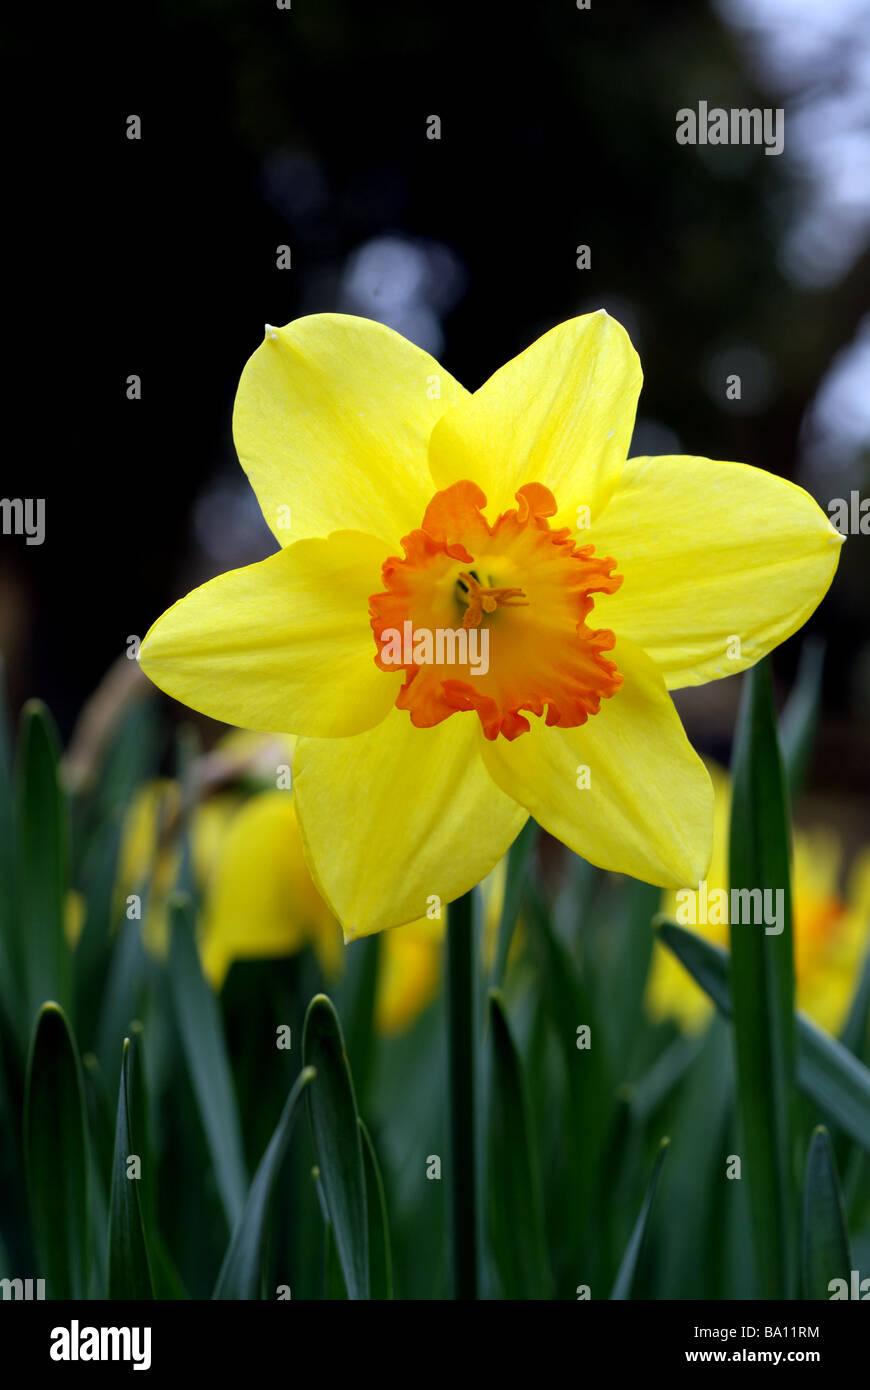 Daffodil flower Stock Photo